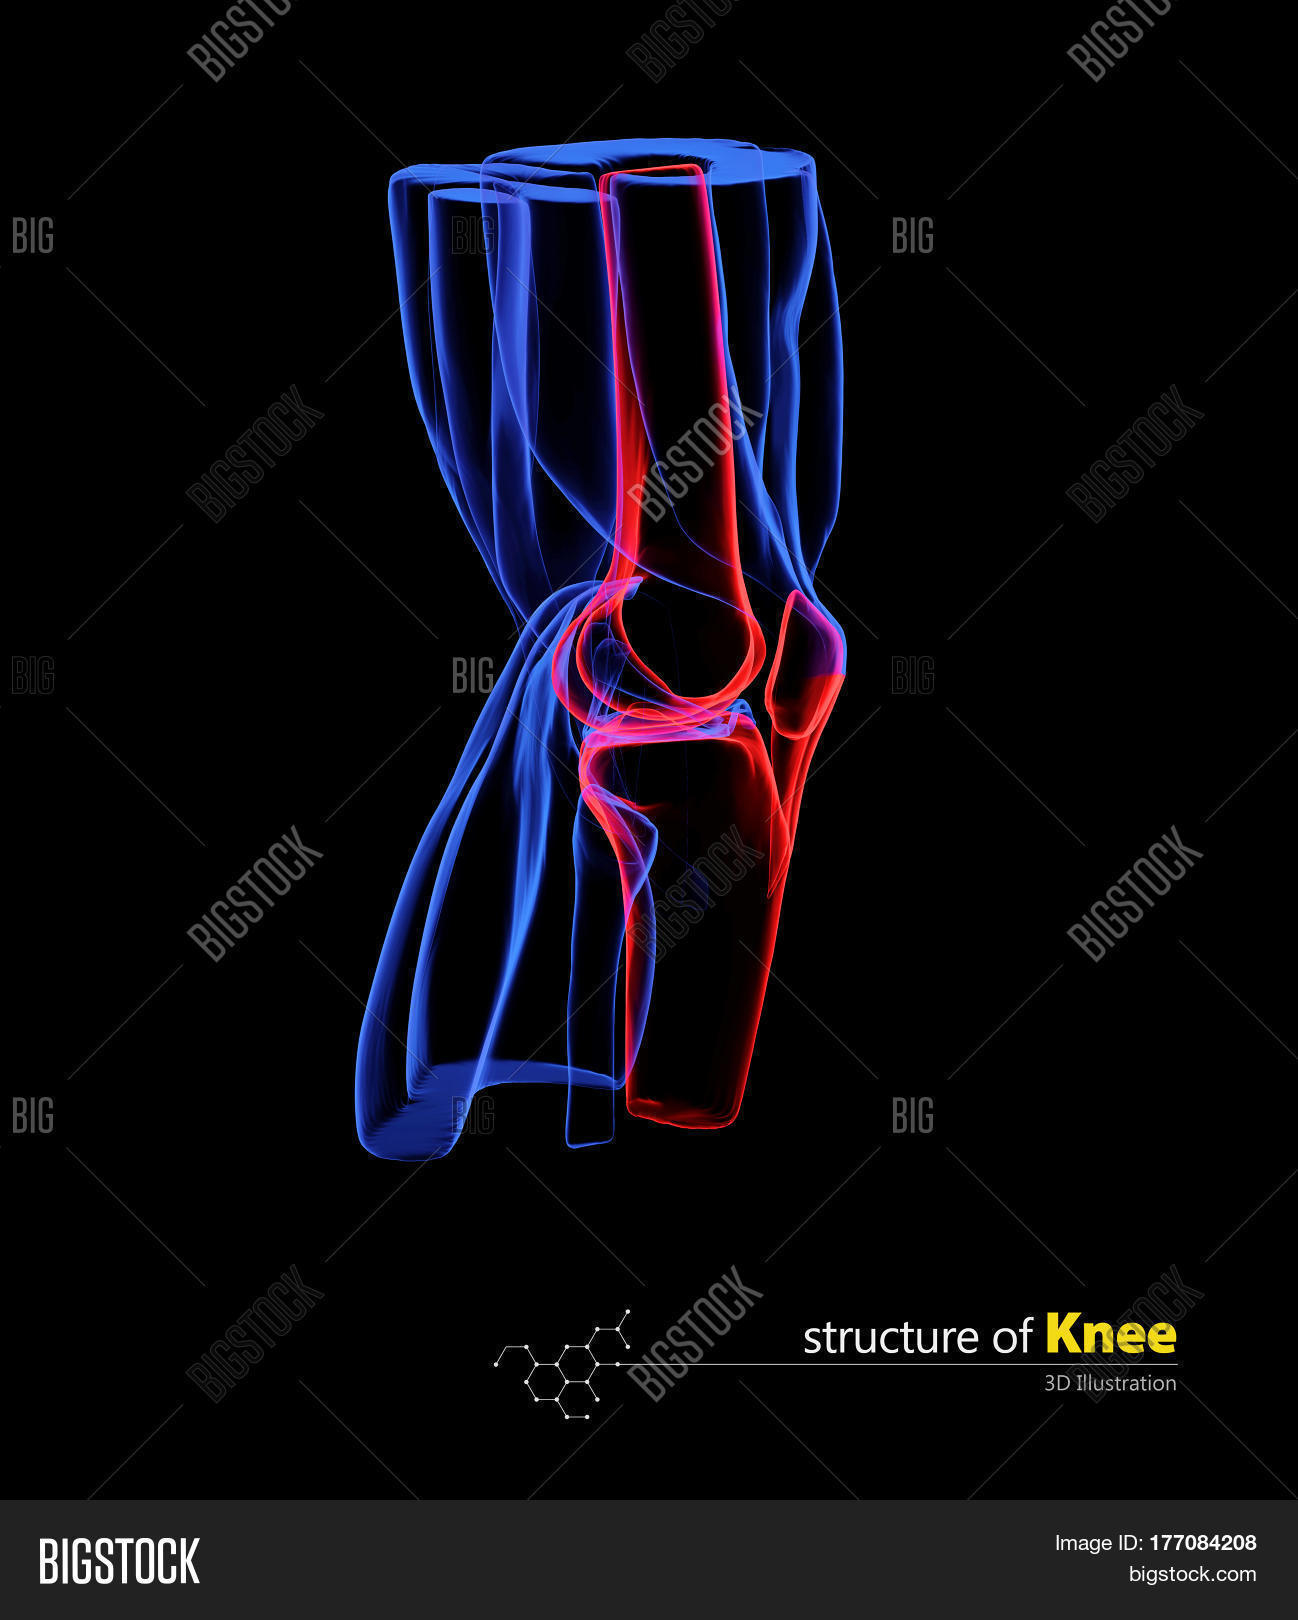 Human Knee Anatomy Image Photo Free Trial Bigstock